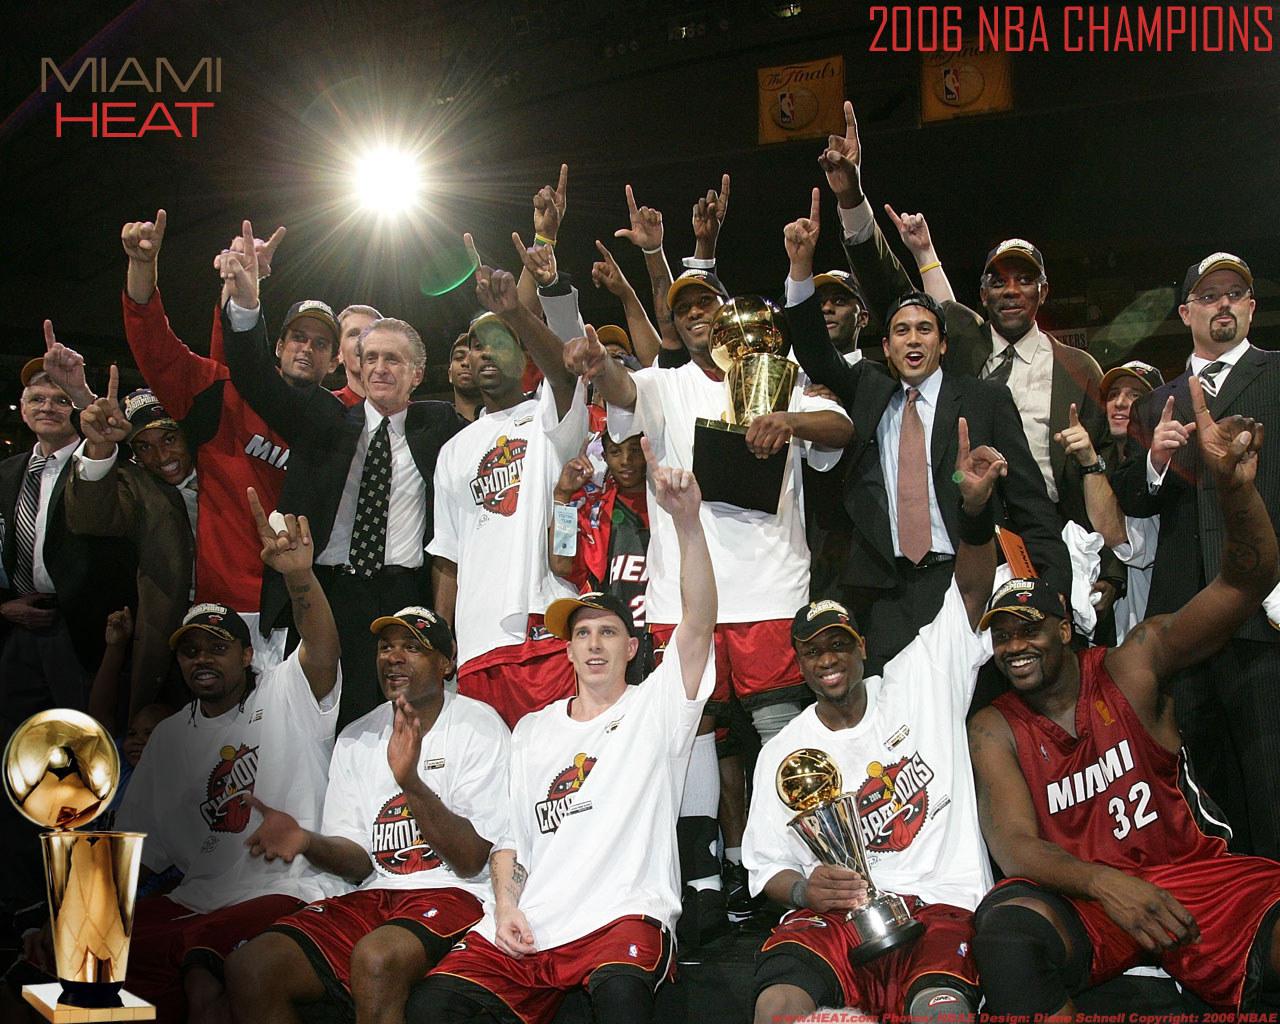 Nba Basketball Miami Heat Bedroom In: Wonderful World Of Sports: My Favourite Basketball Team